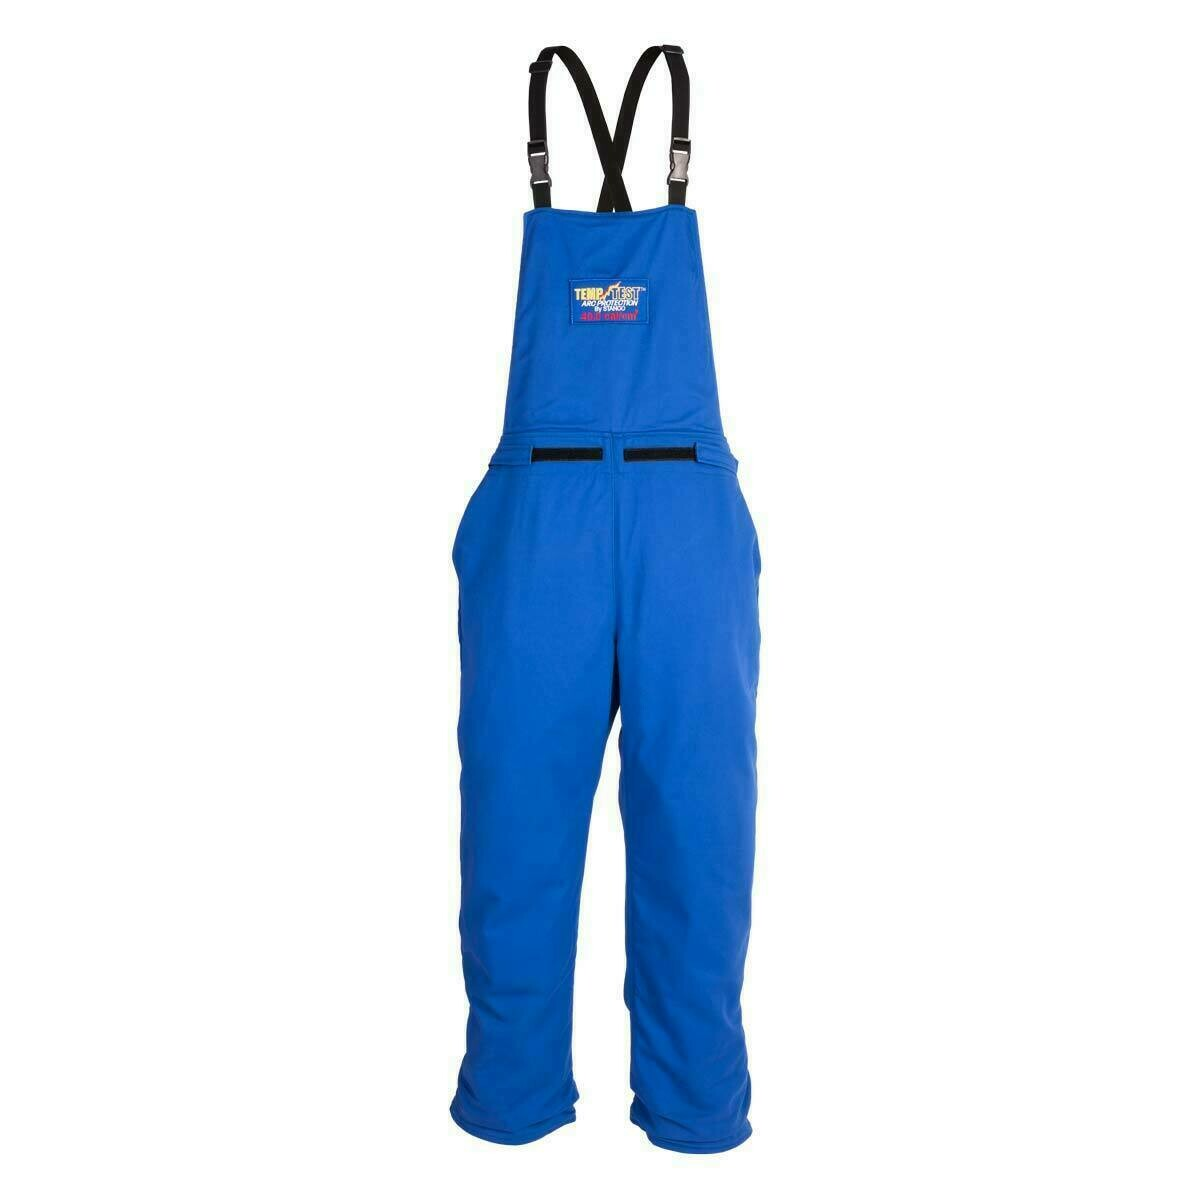 TT11-670 Temp Test™ Arc Protection Bib Overall M Royal Blue Cat 2 Arc 12.4/cal